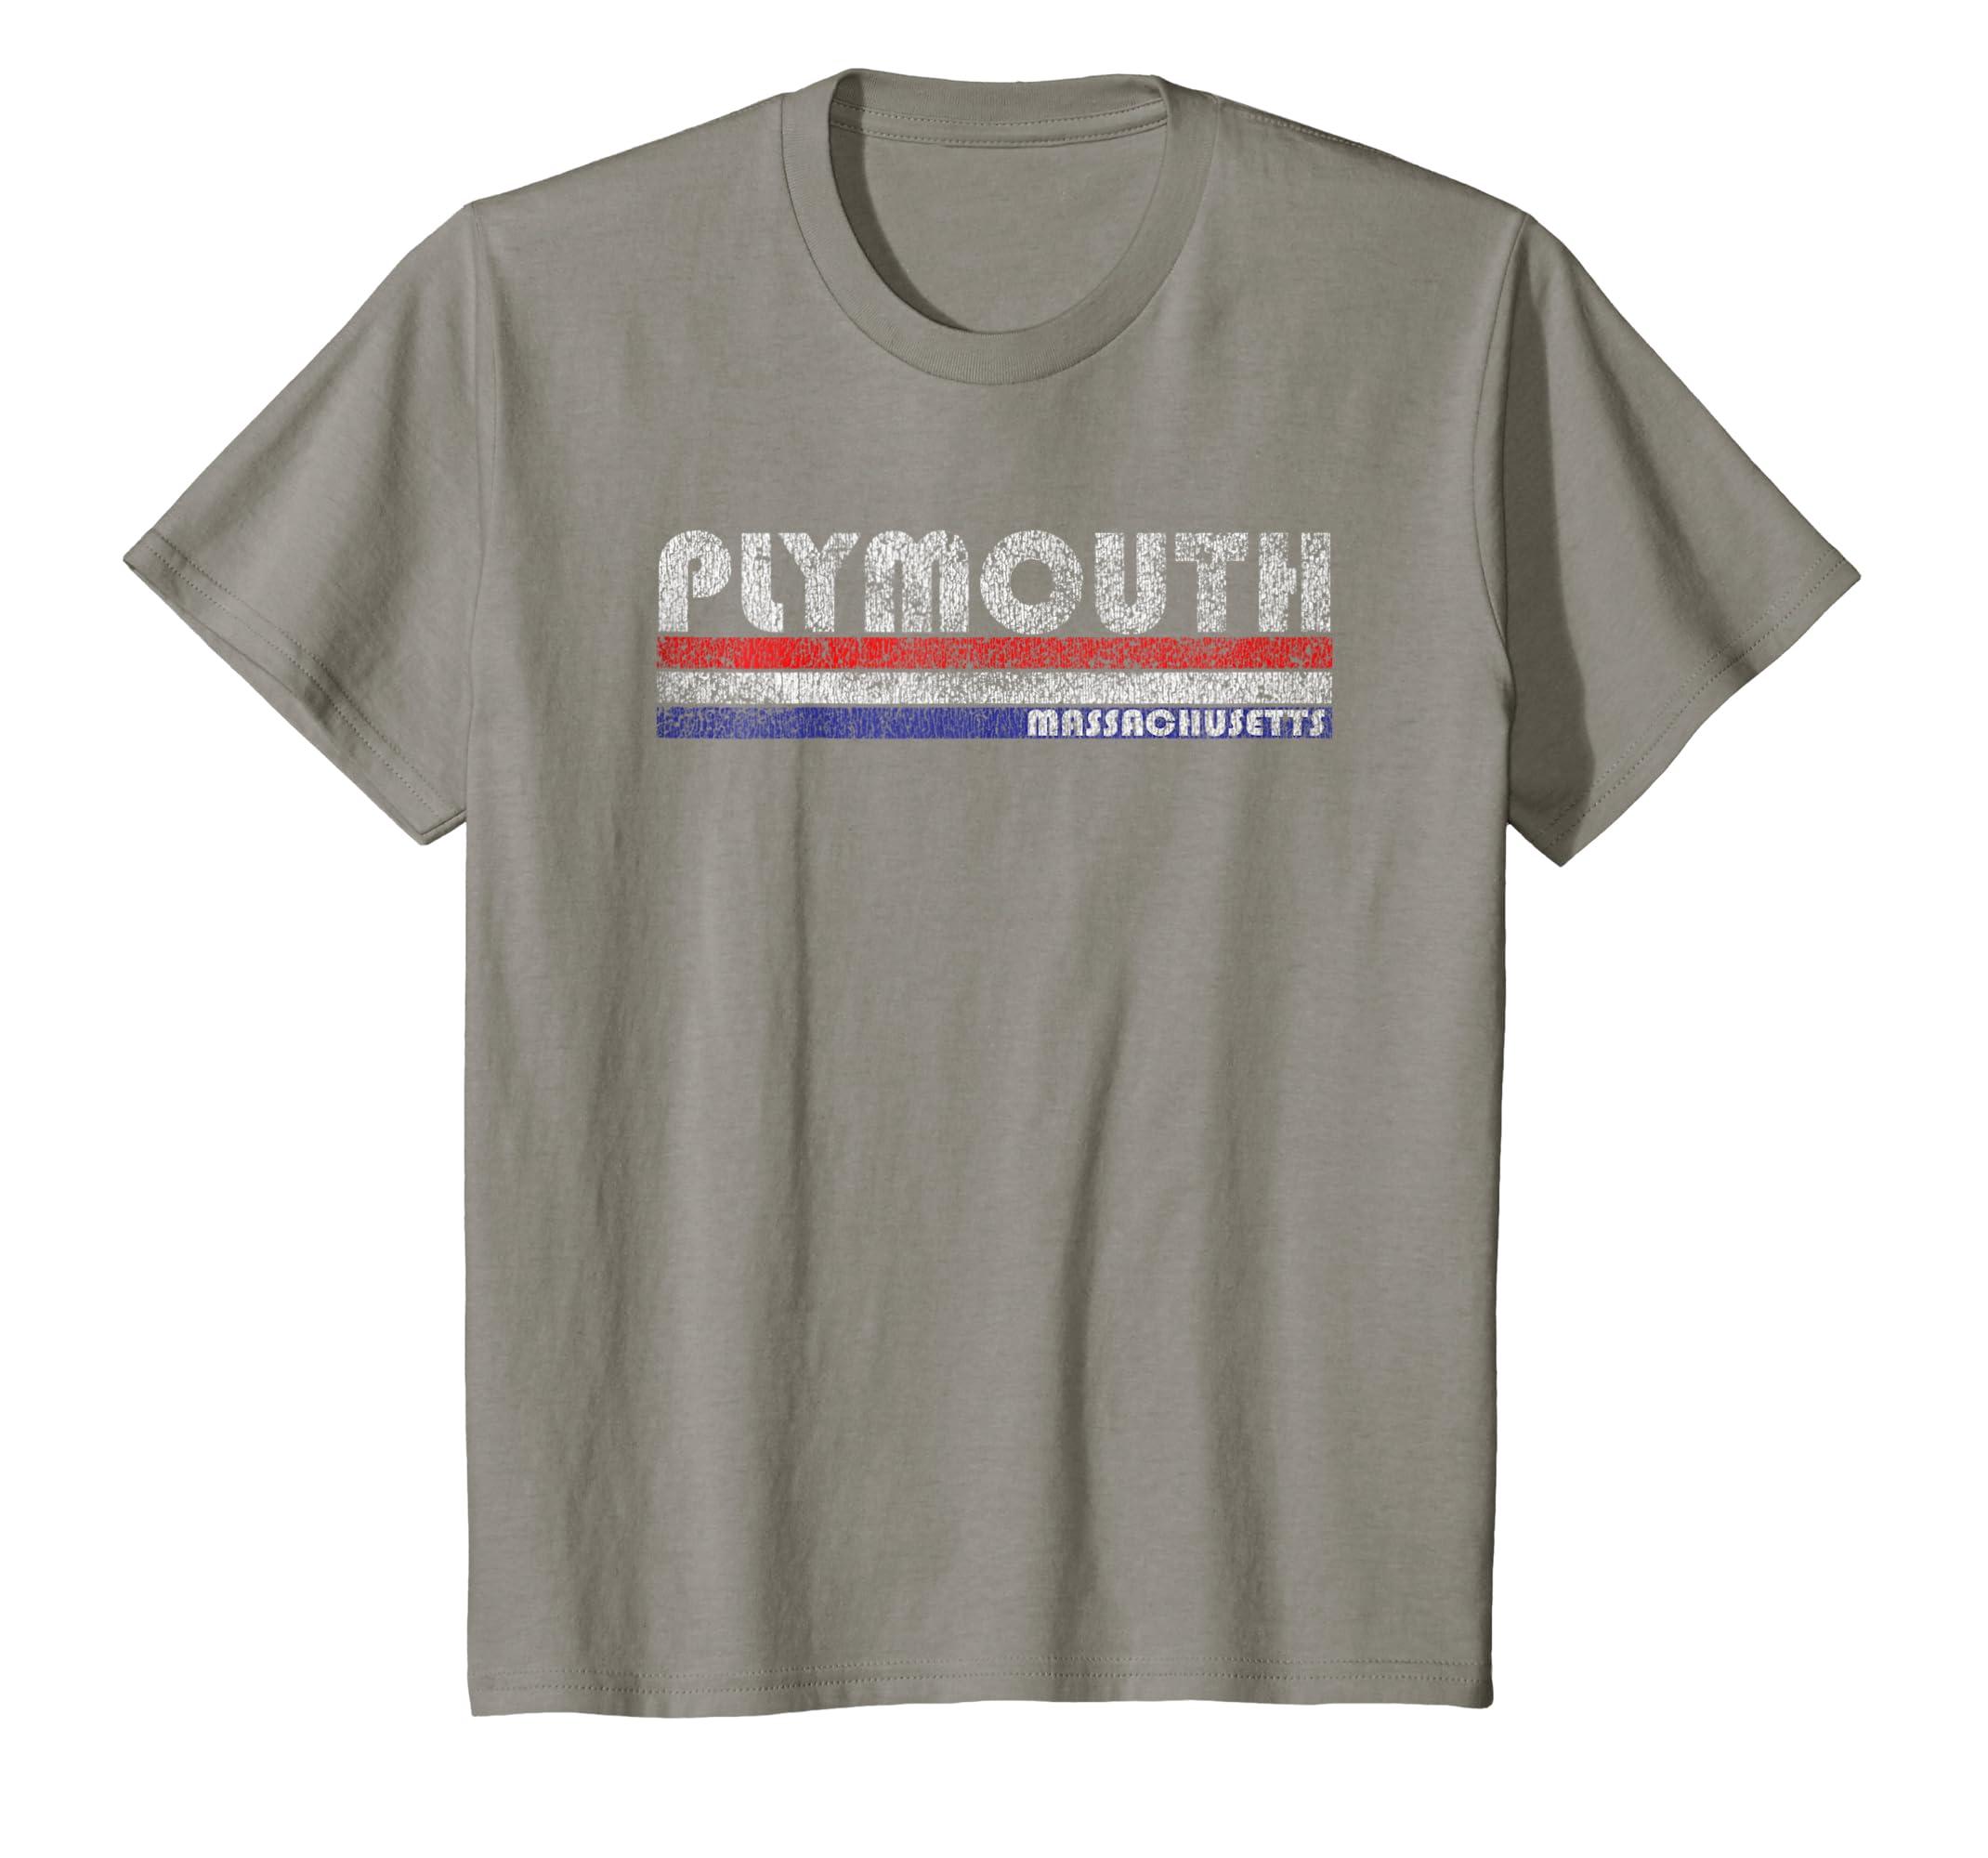 Amazon com: Vintage Plymouth MA Throwback T-Shirt: Clothing